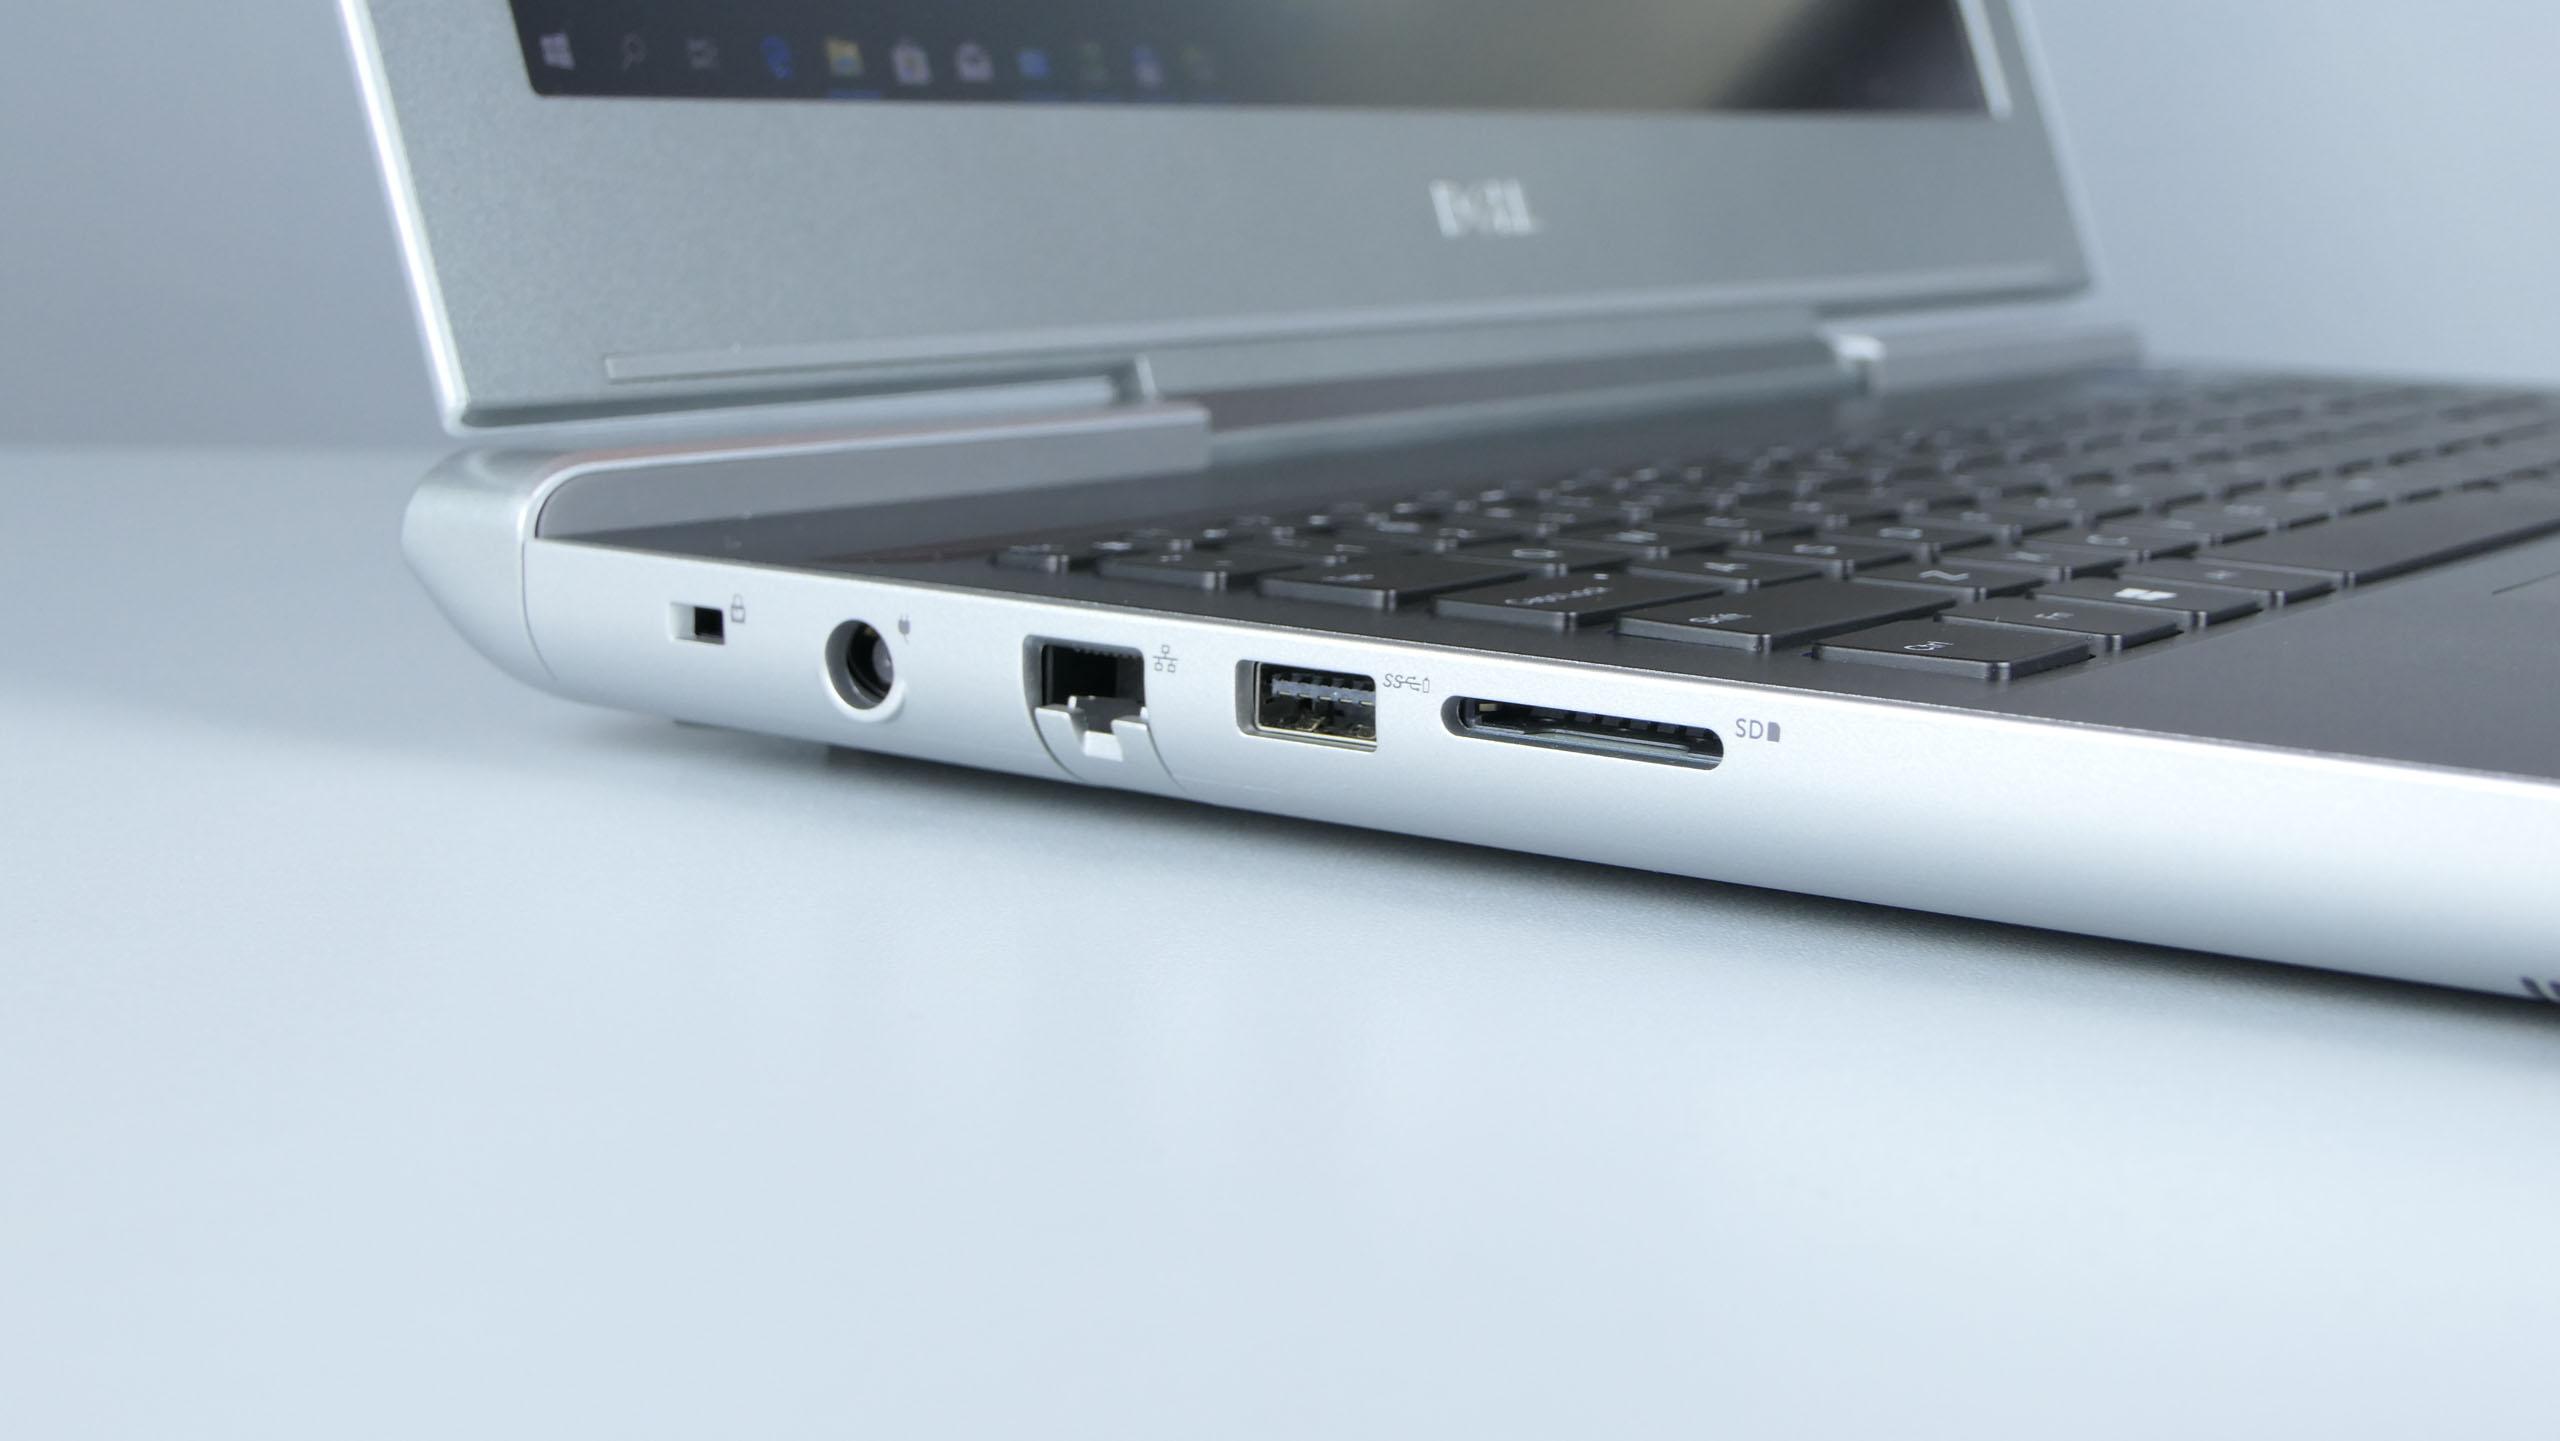 Dell Vostro 7580 - zasilanie, LAN, USB 3.0 oraz czytnik kart SD